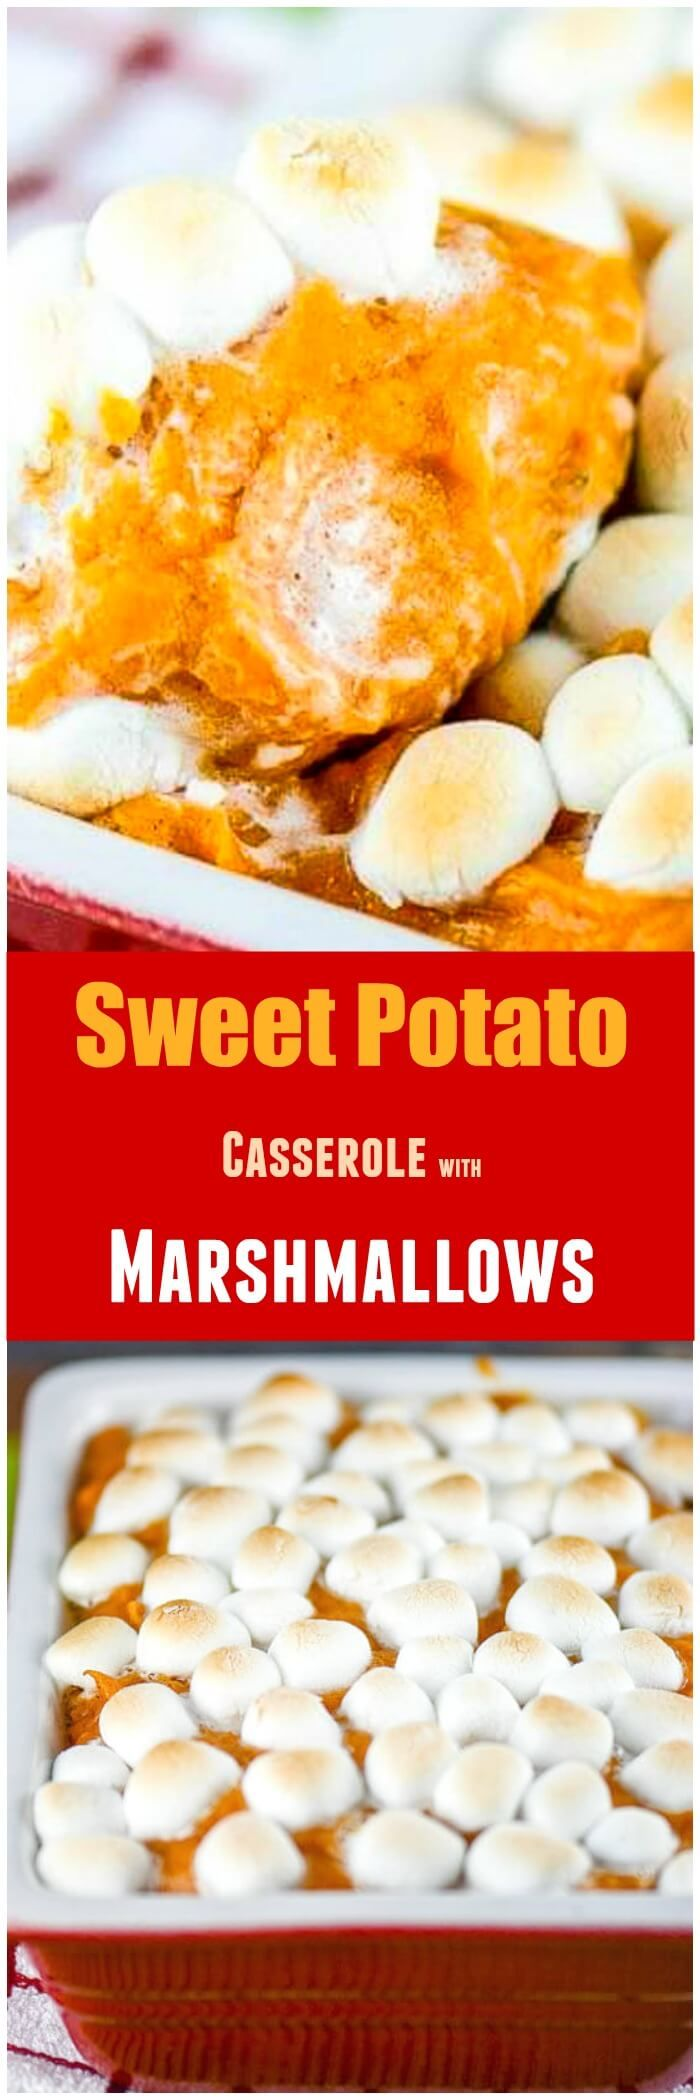 Sweet Potato Casserole with Marshmallows via @flavormosaic